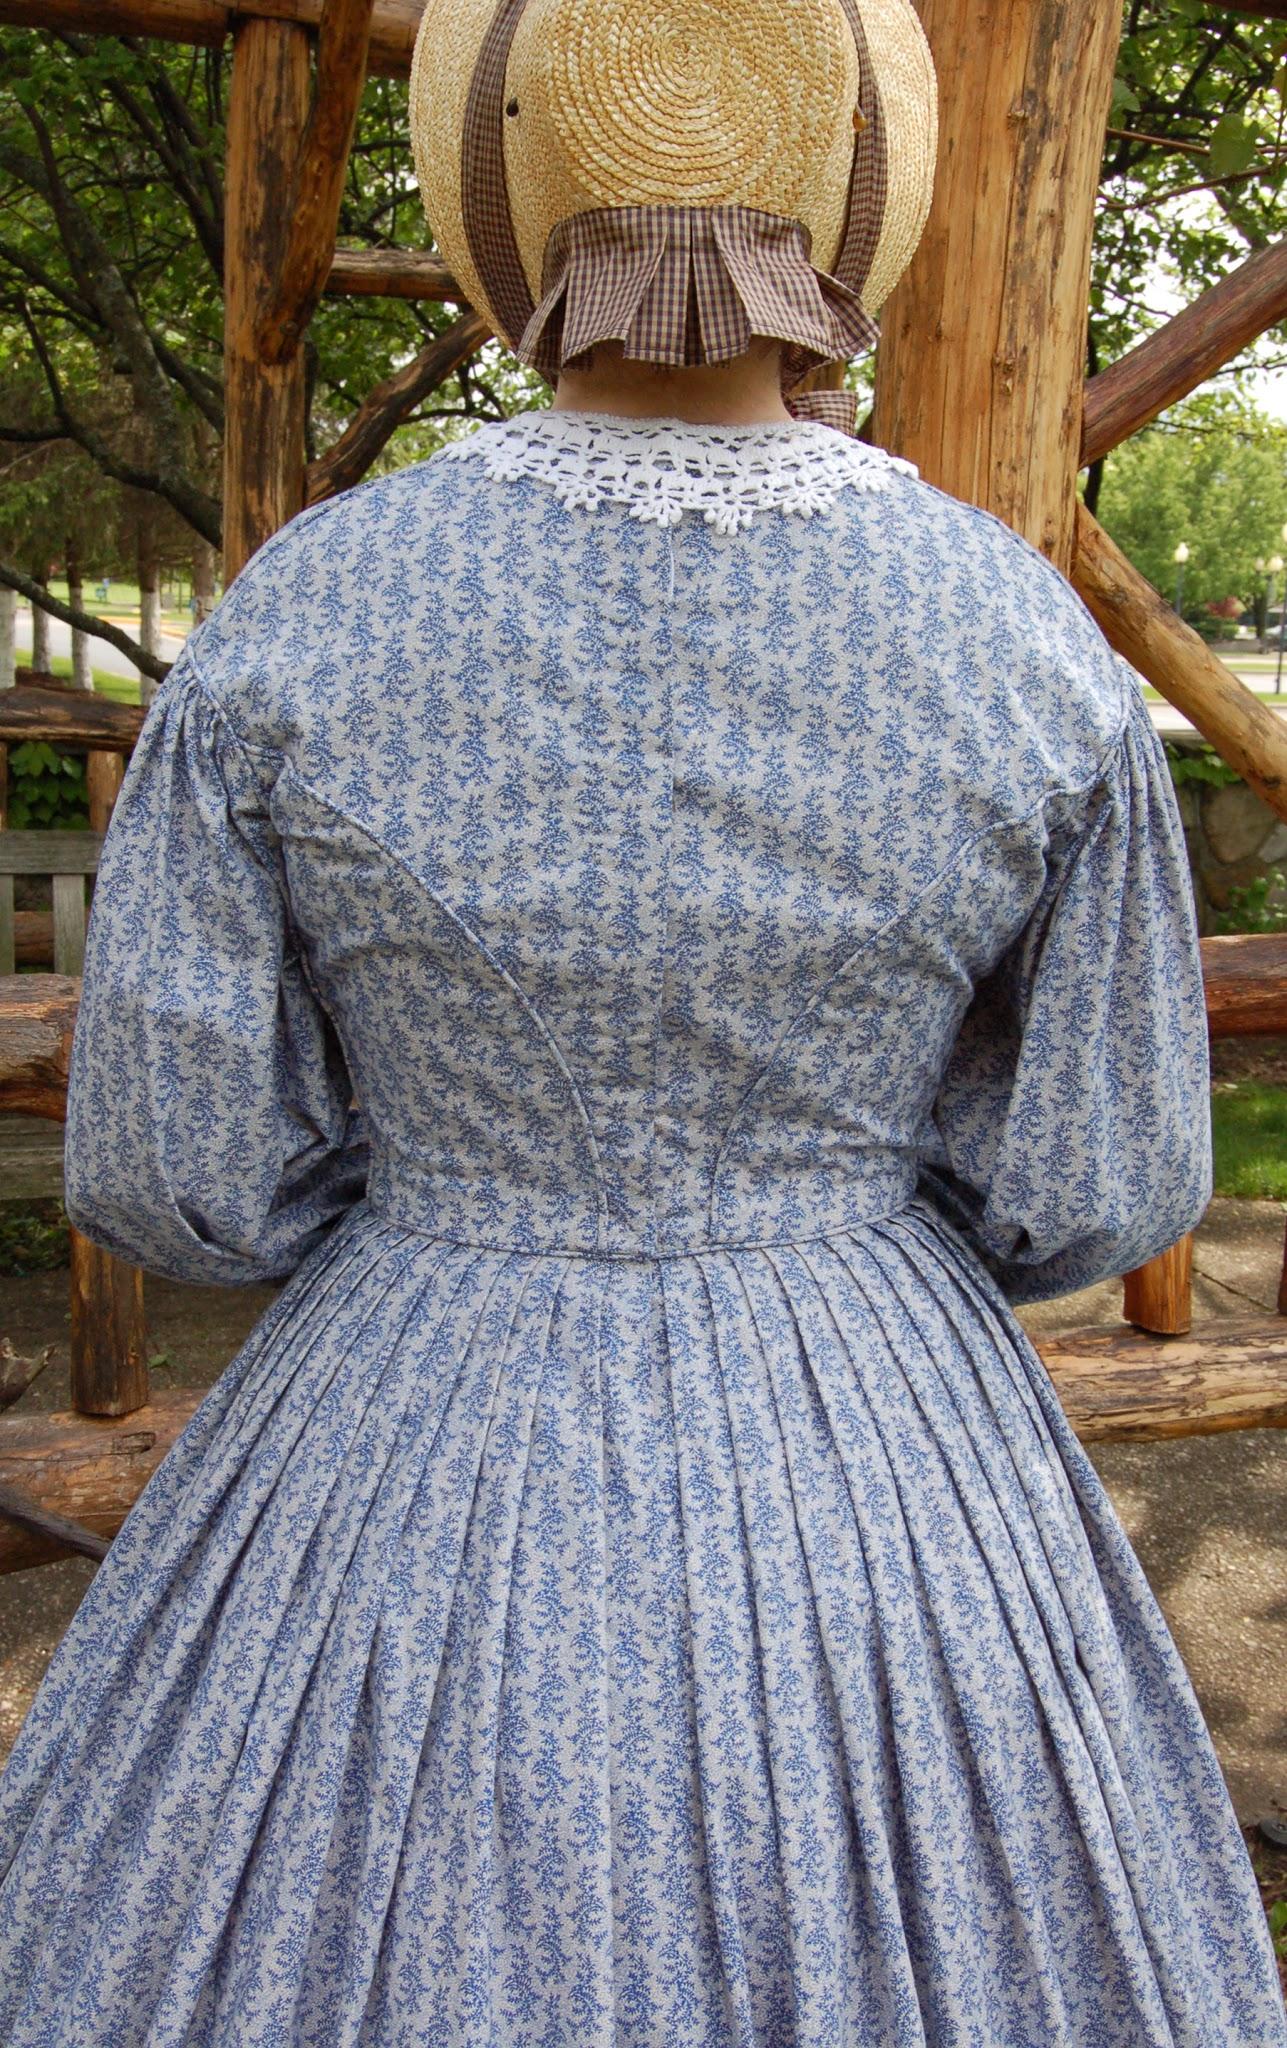 Dolly Creates: Civil War Series • Blue Floral Day Dress